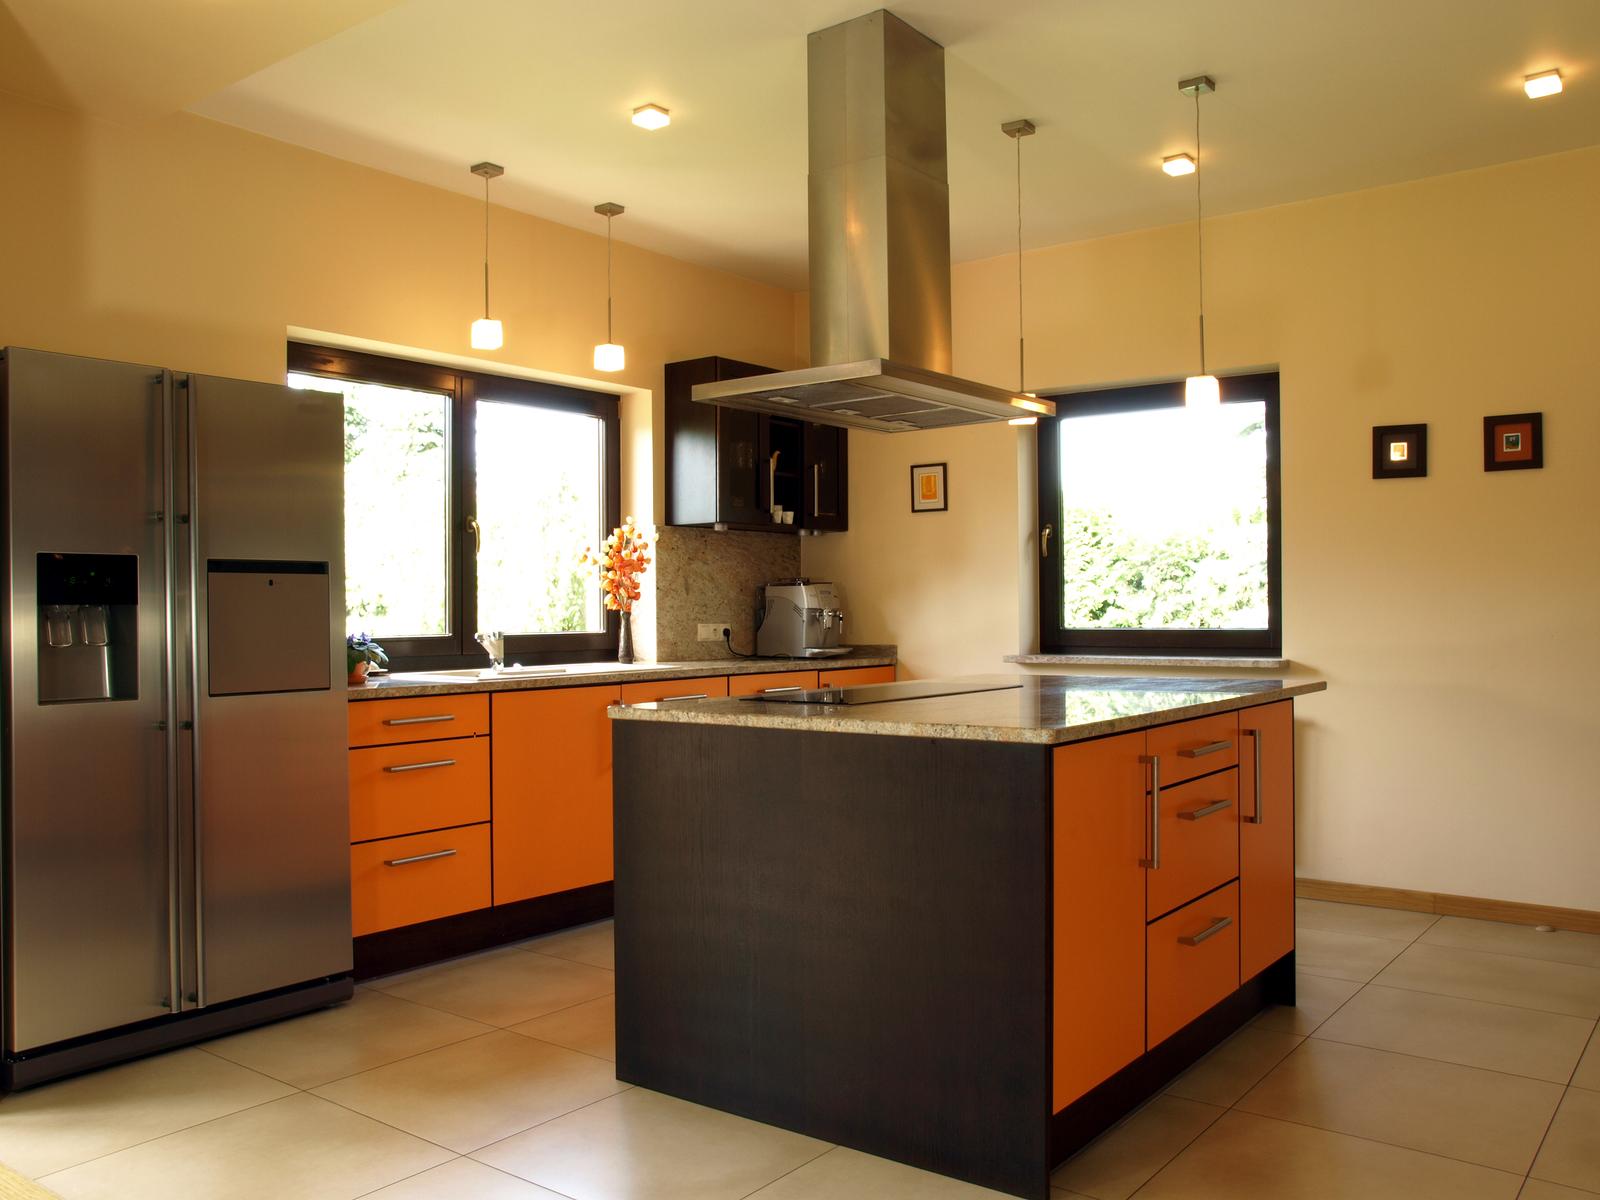 Comfortable kitchen interior with a modern design